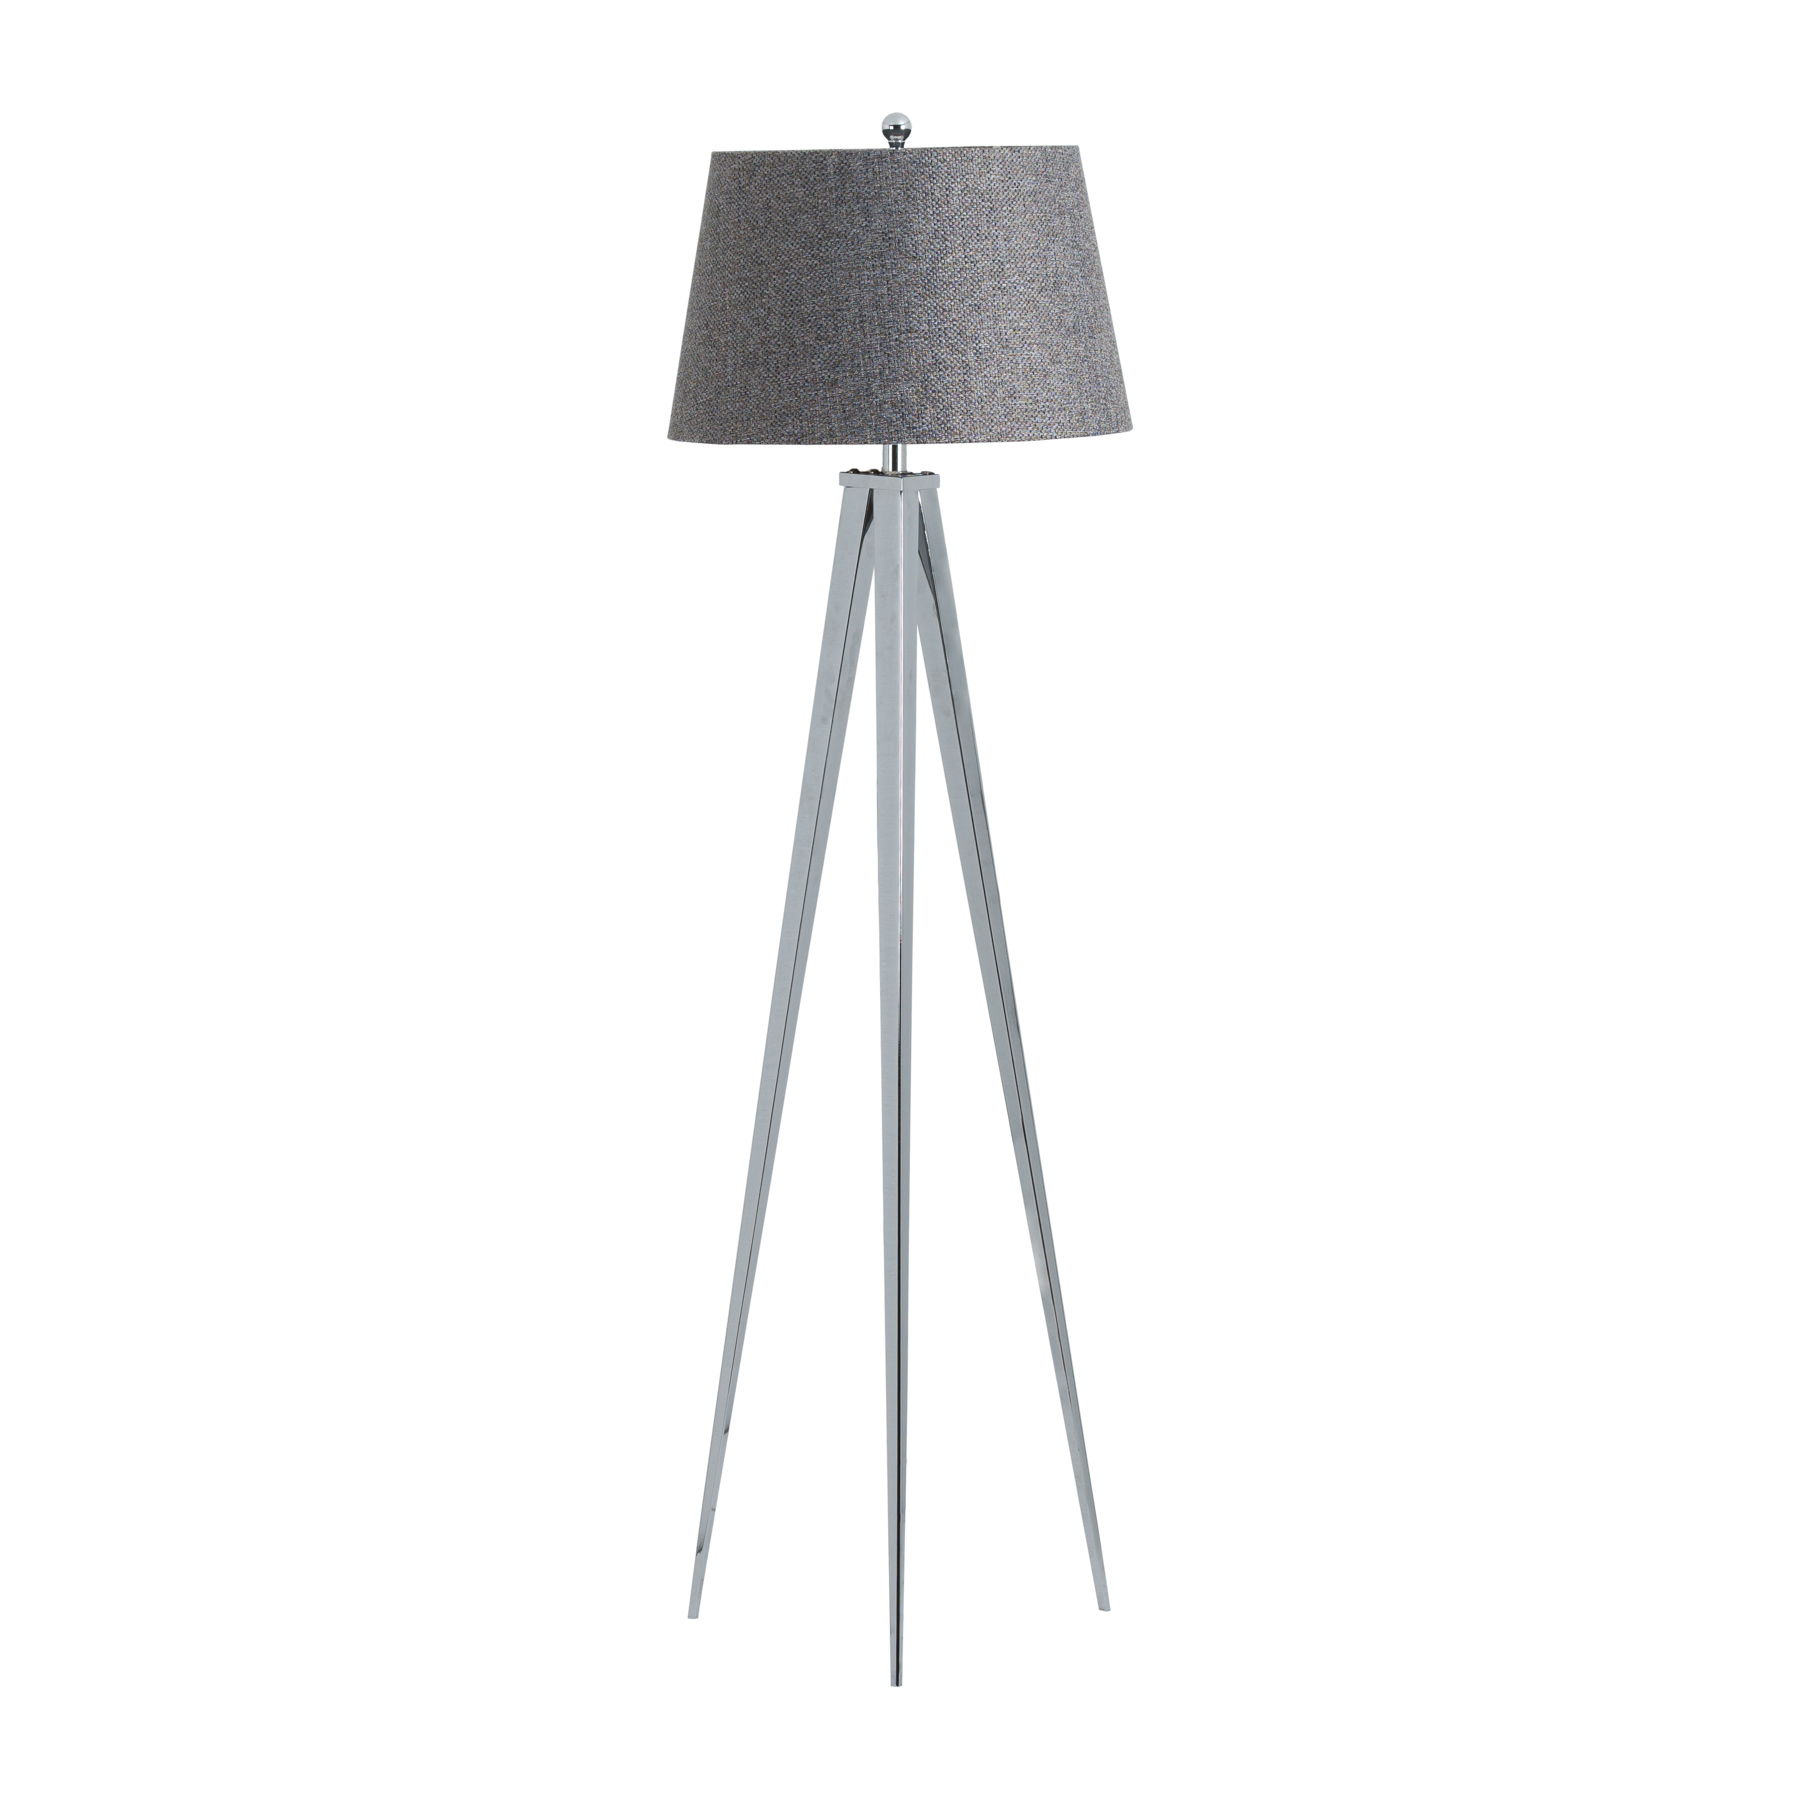 The Belgravia Chrome Tripod Floor Lamp